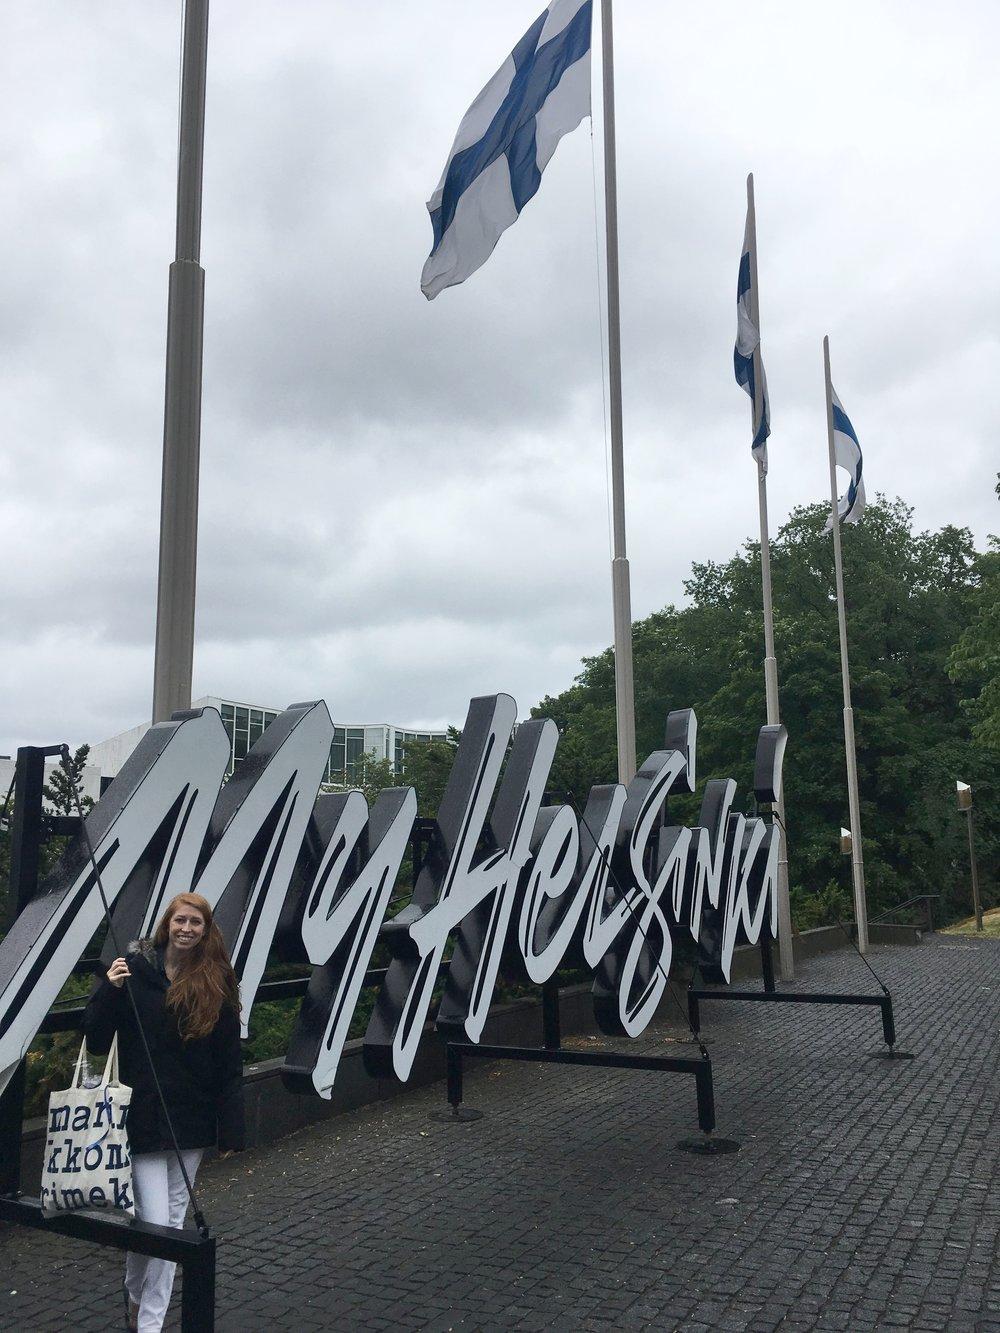 myhelsinki sign - what to do in helsinki